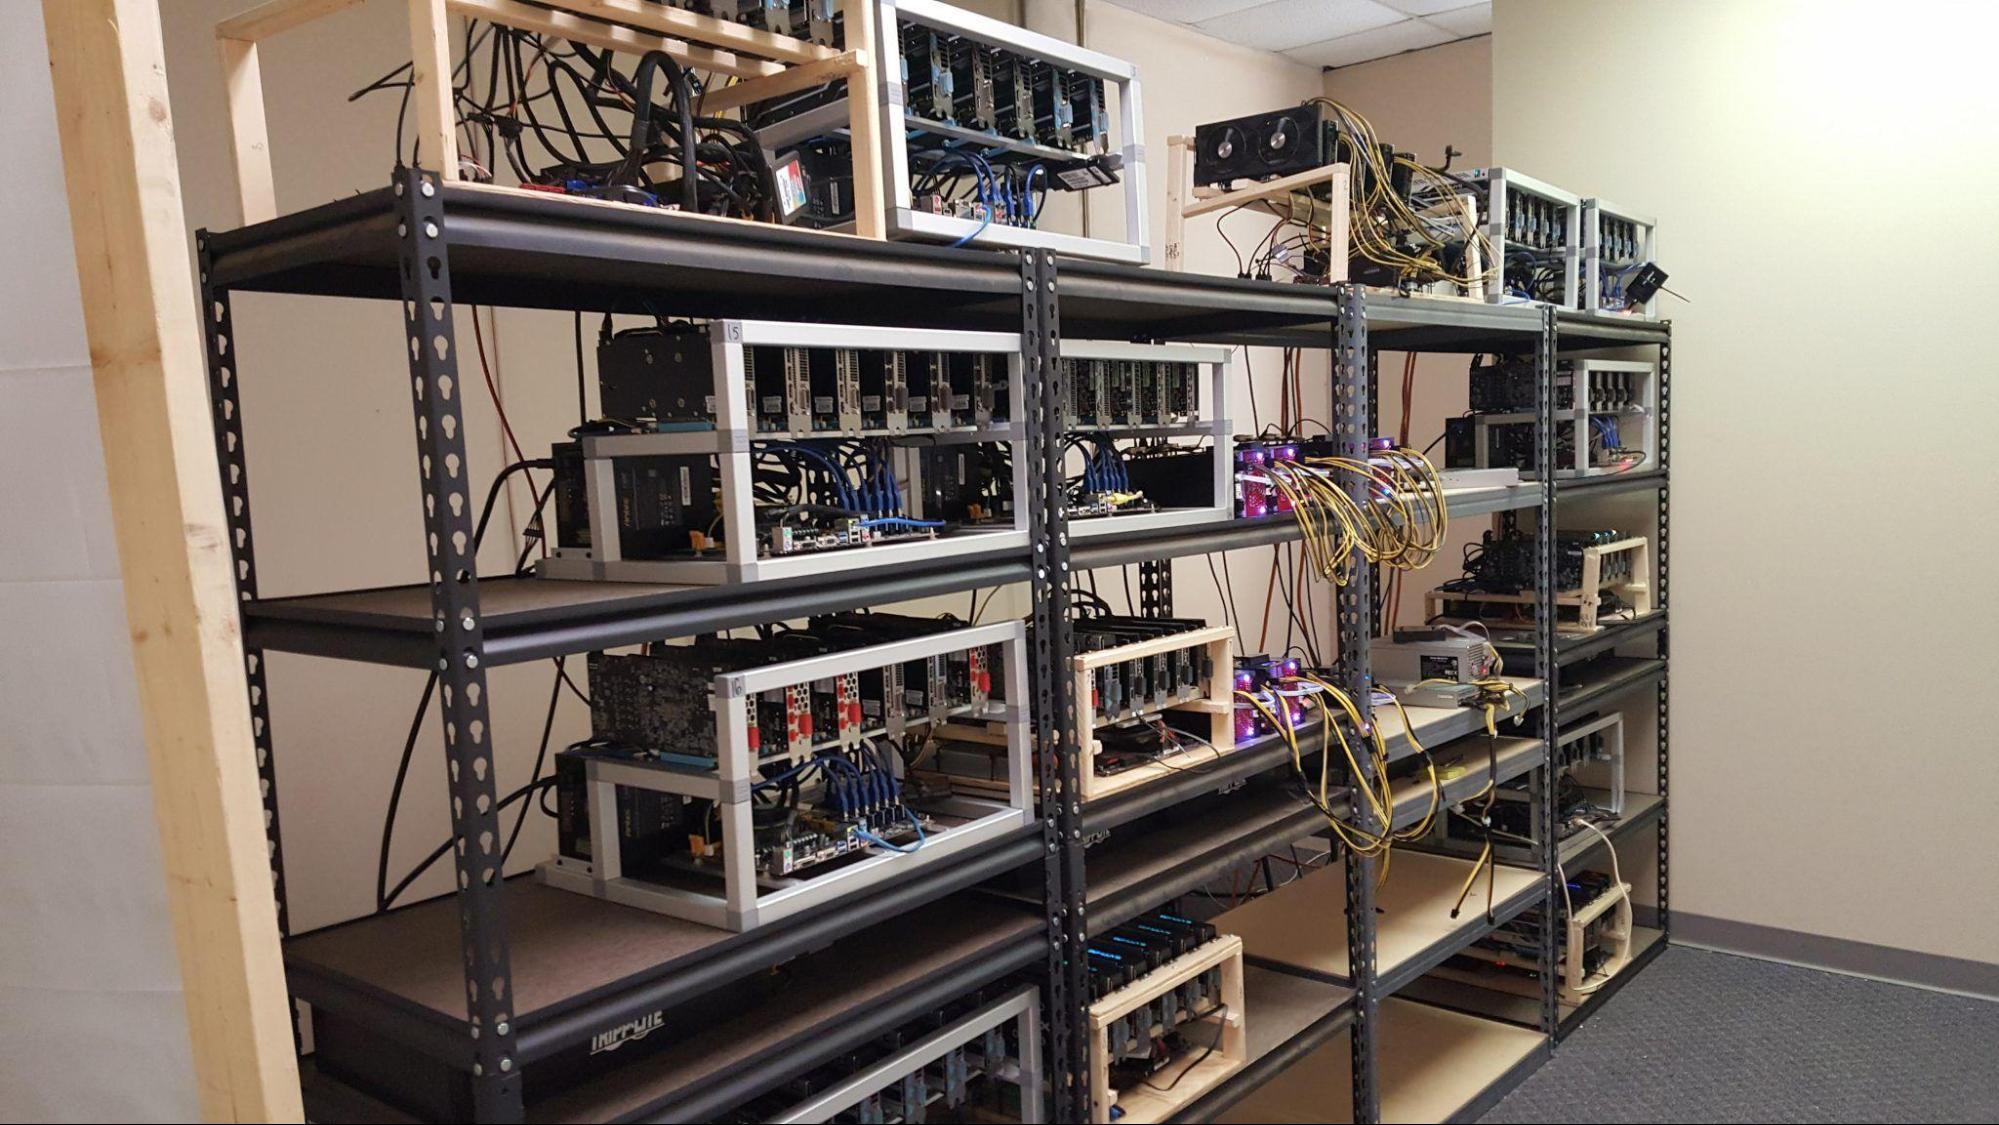 https://cdn.arstechnica.net/wp-content/uploads/2018/01/2nd-Rig-8-GTX-1070s-Manufactured-1.jpg